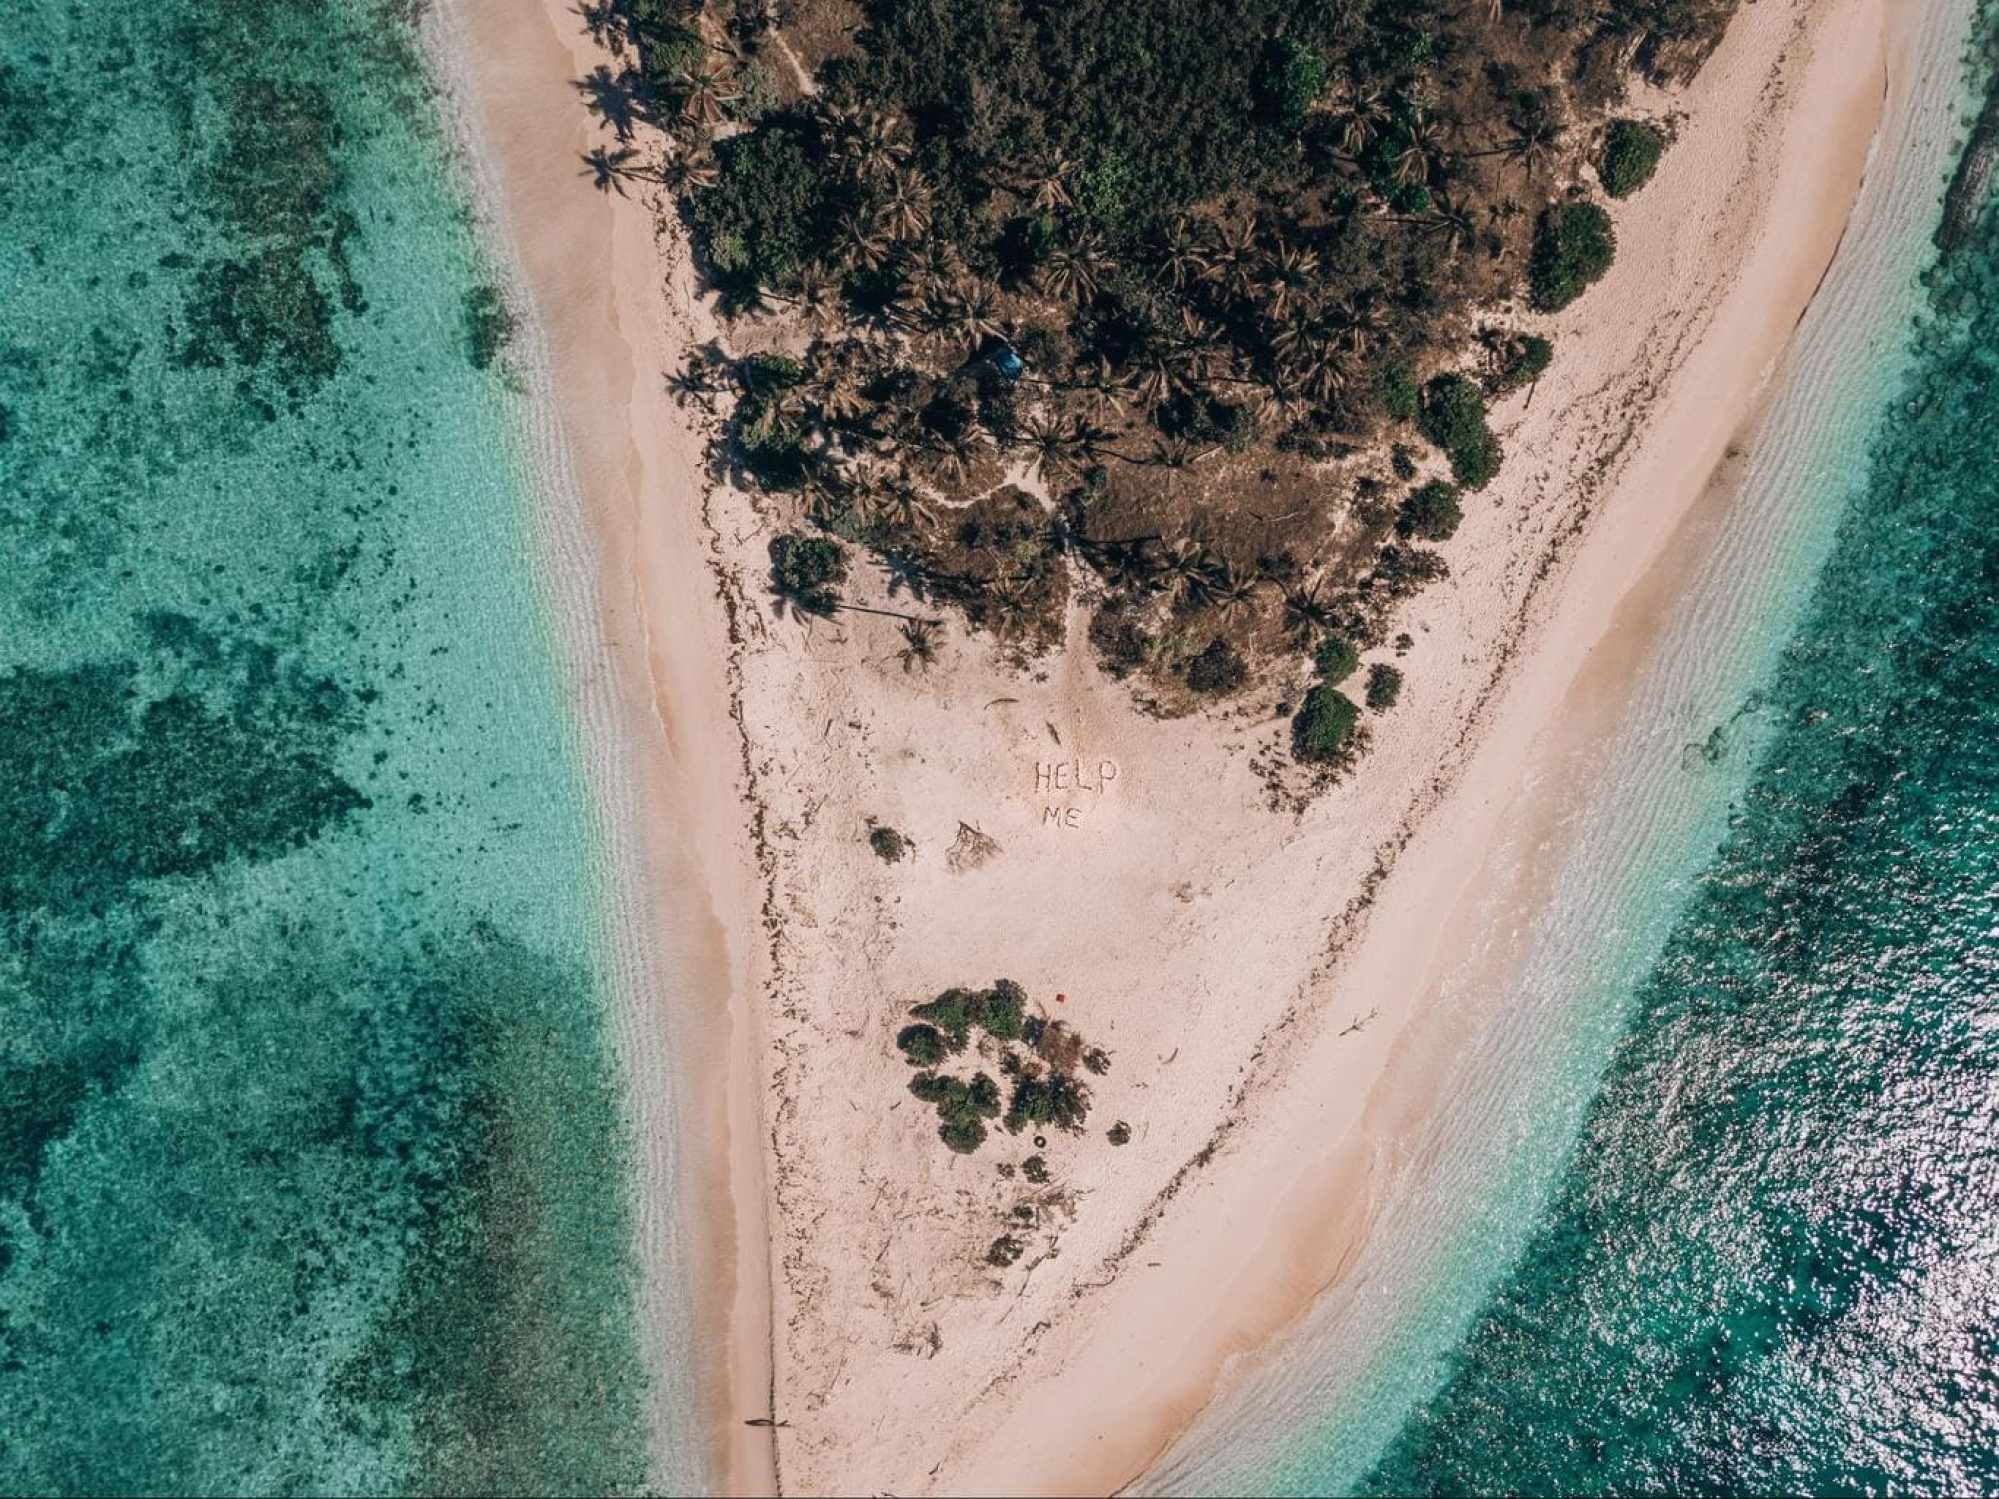 Mondriki Island from the movie Cast Away